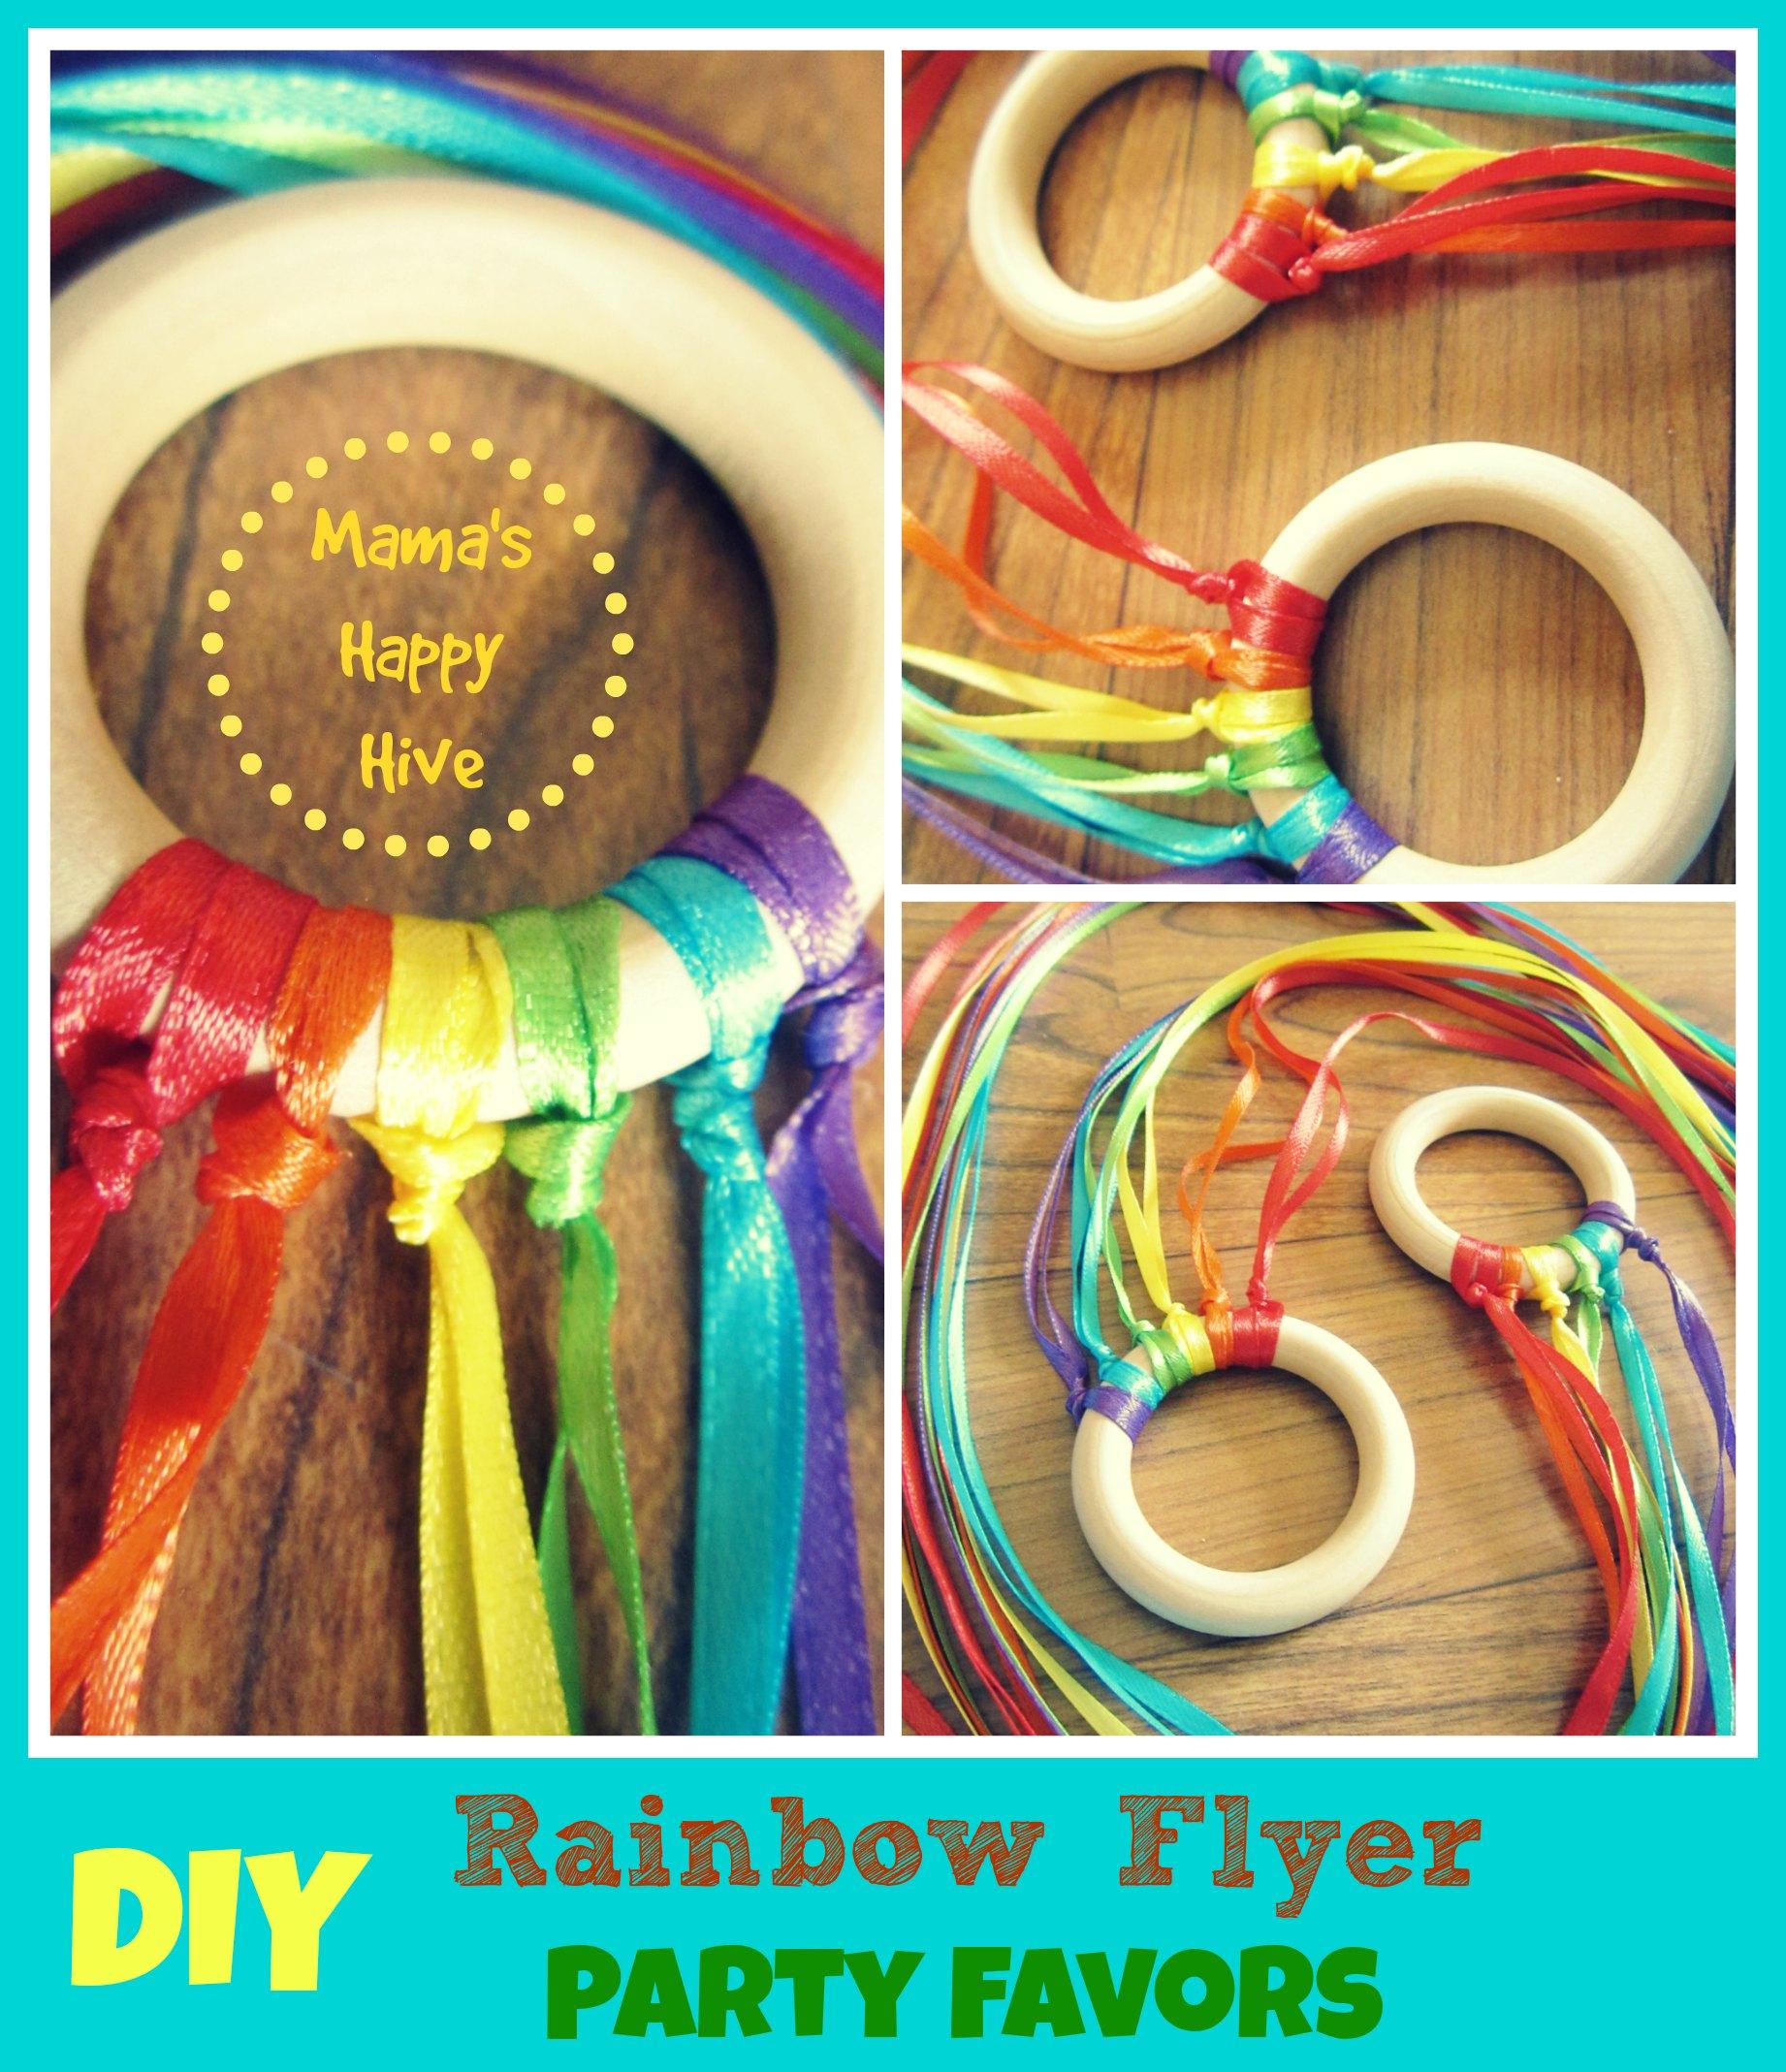 DIY Party Favors: Mini Rainbow Flyer